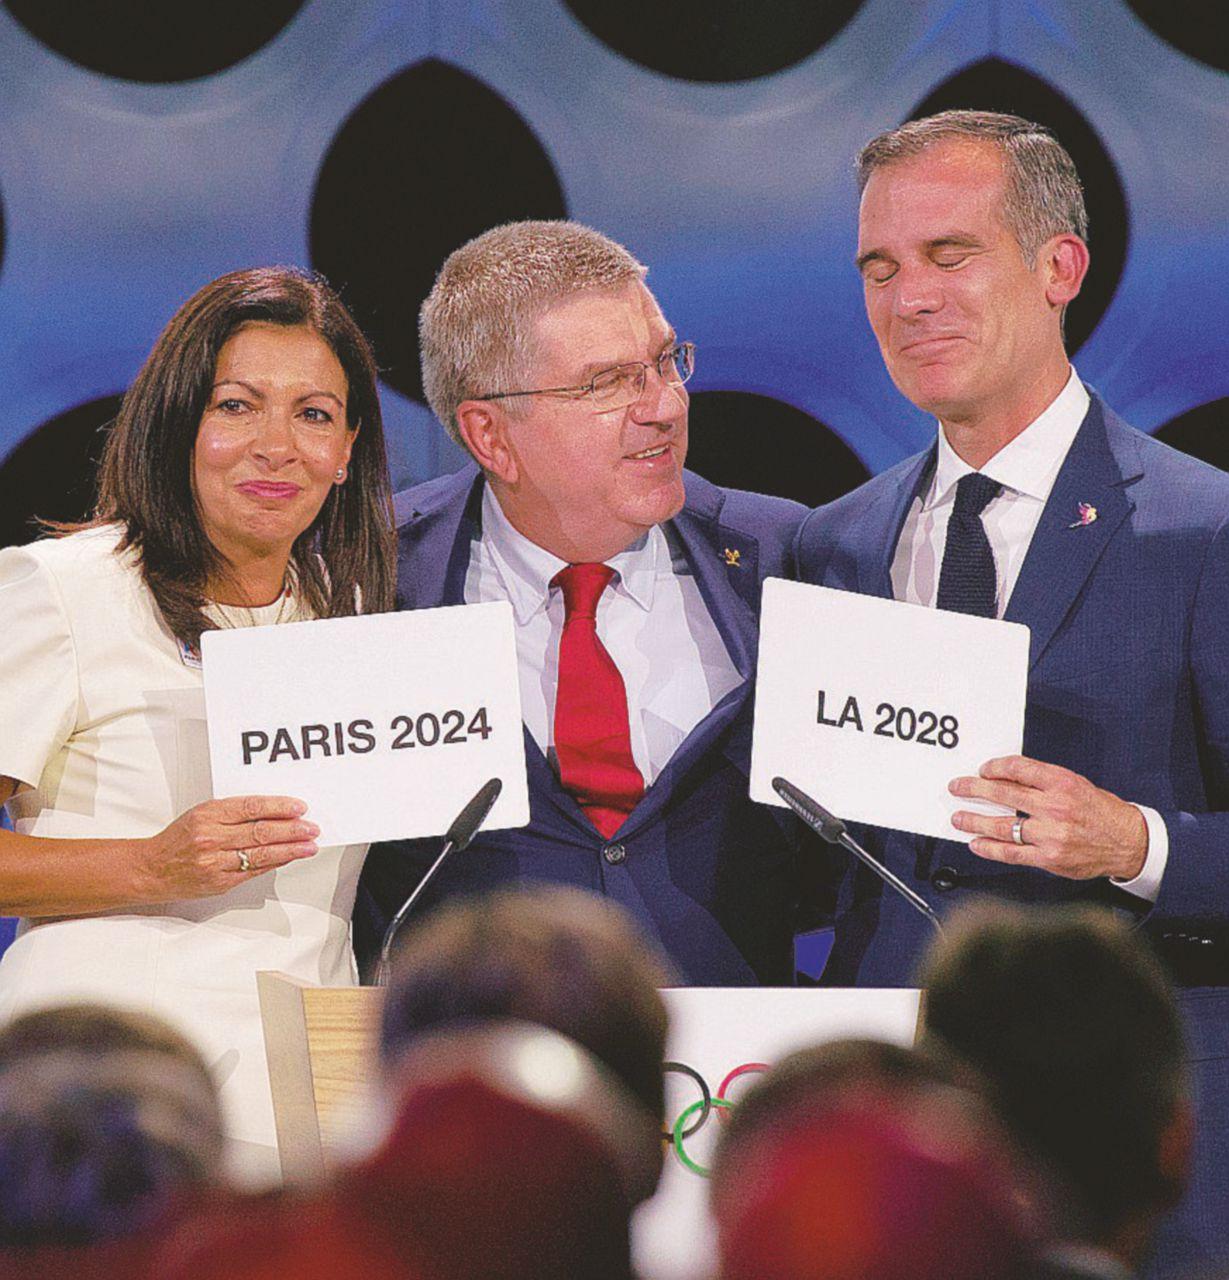 Le Olimpiadi in svendita: Parigi 2024, poi negli Usa